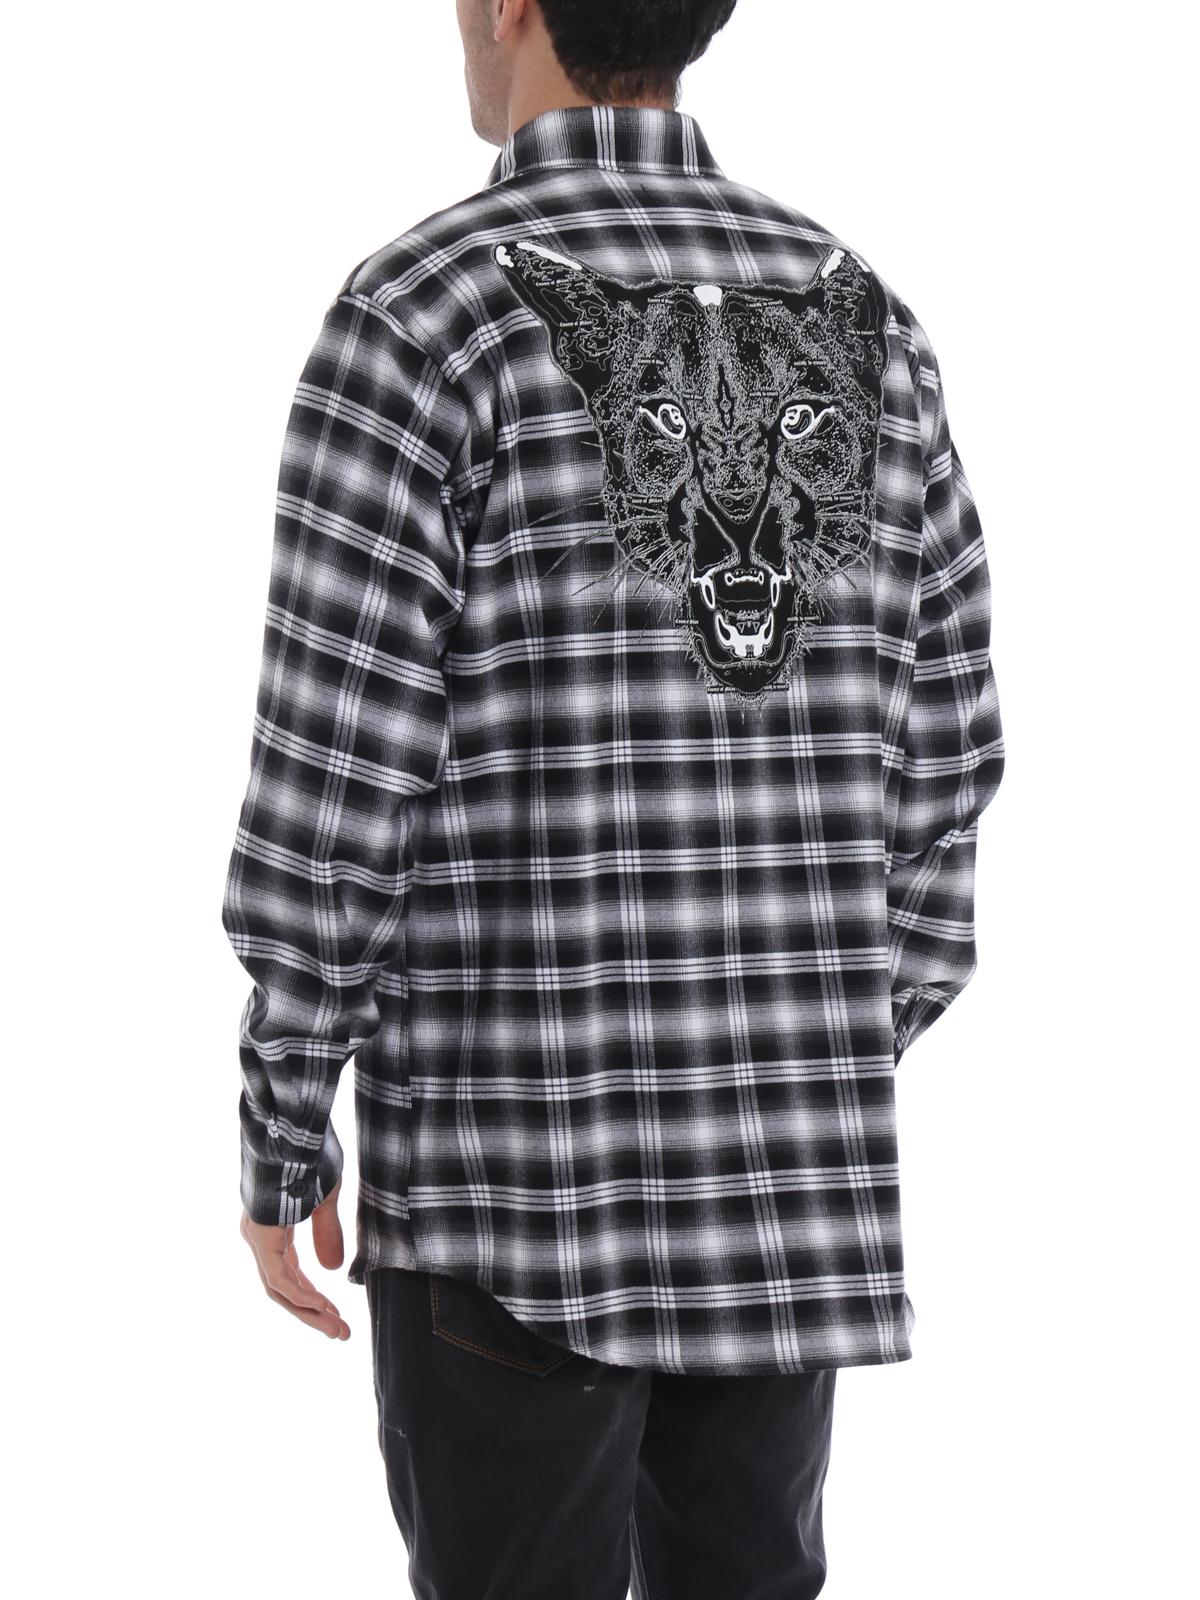 bff3e97749f5 Marcelo Burlon - Puma check flannel shirt - shirts ...